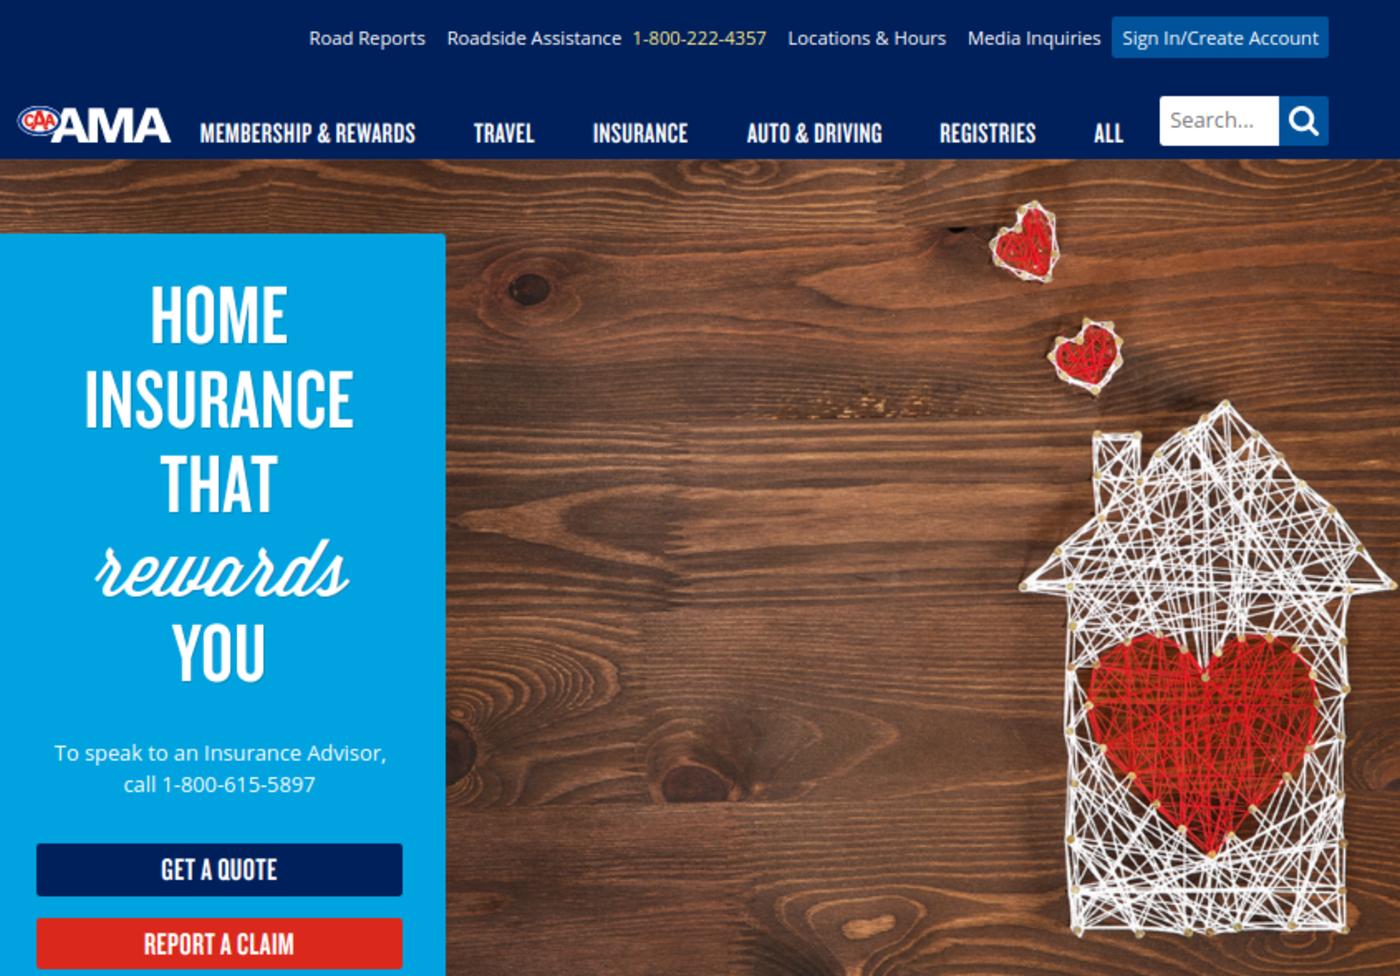 Ama home insurance